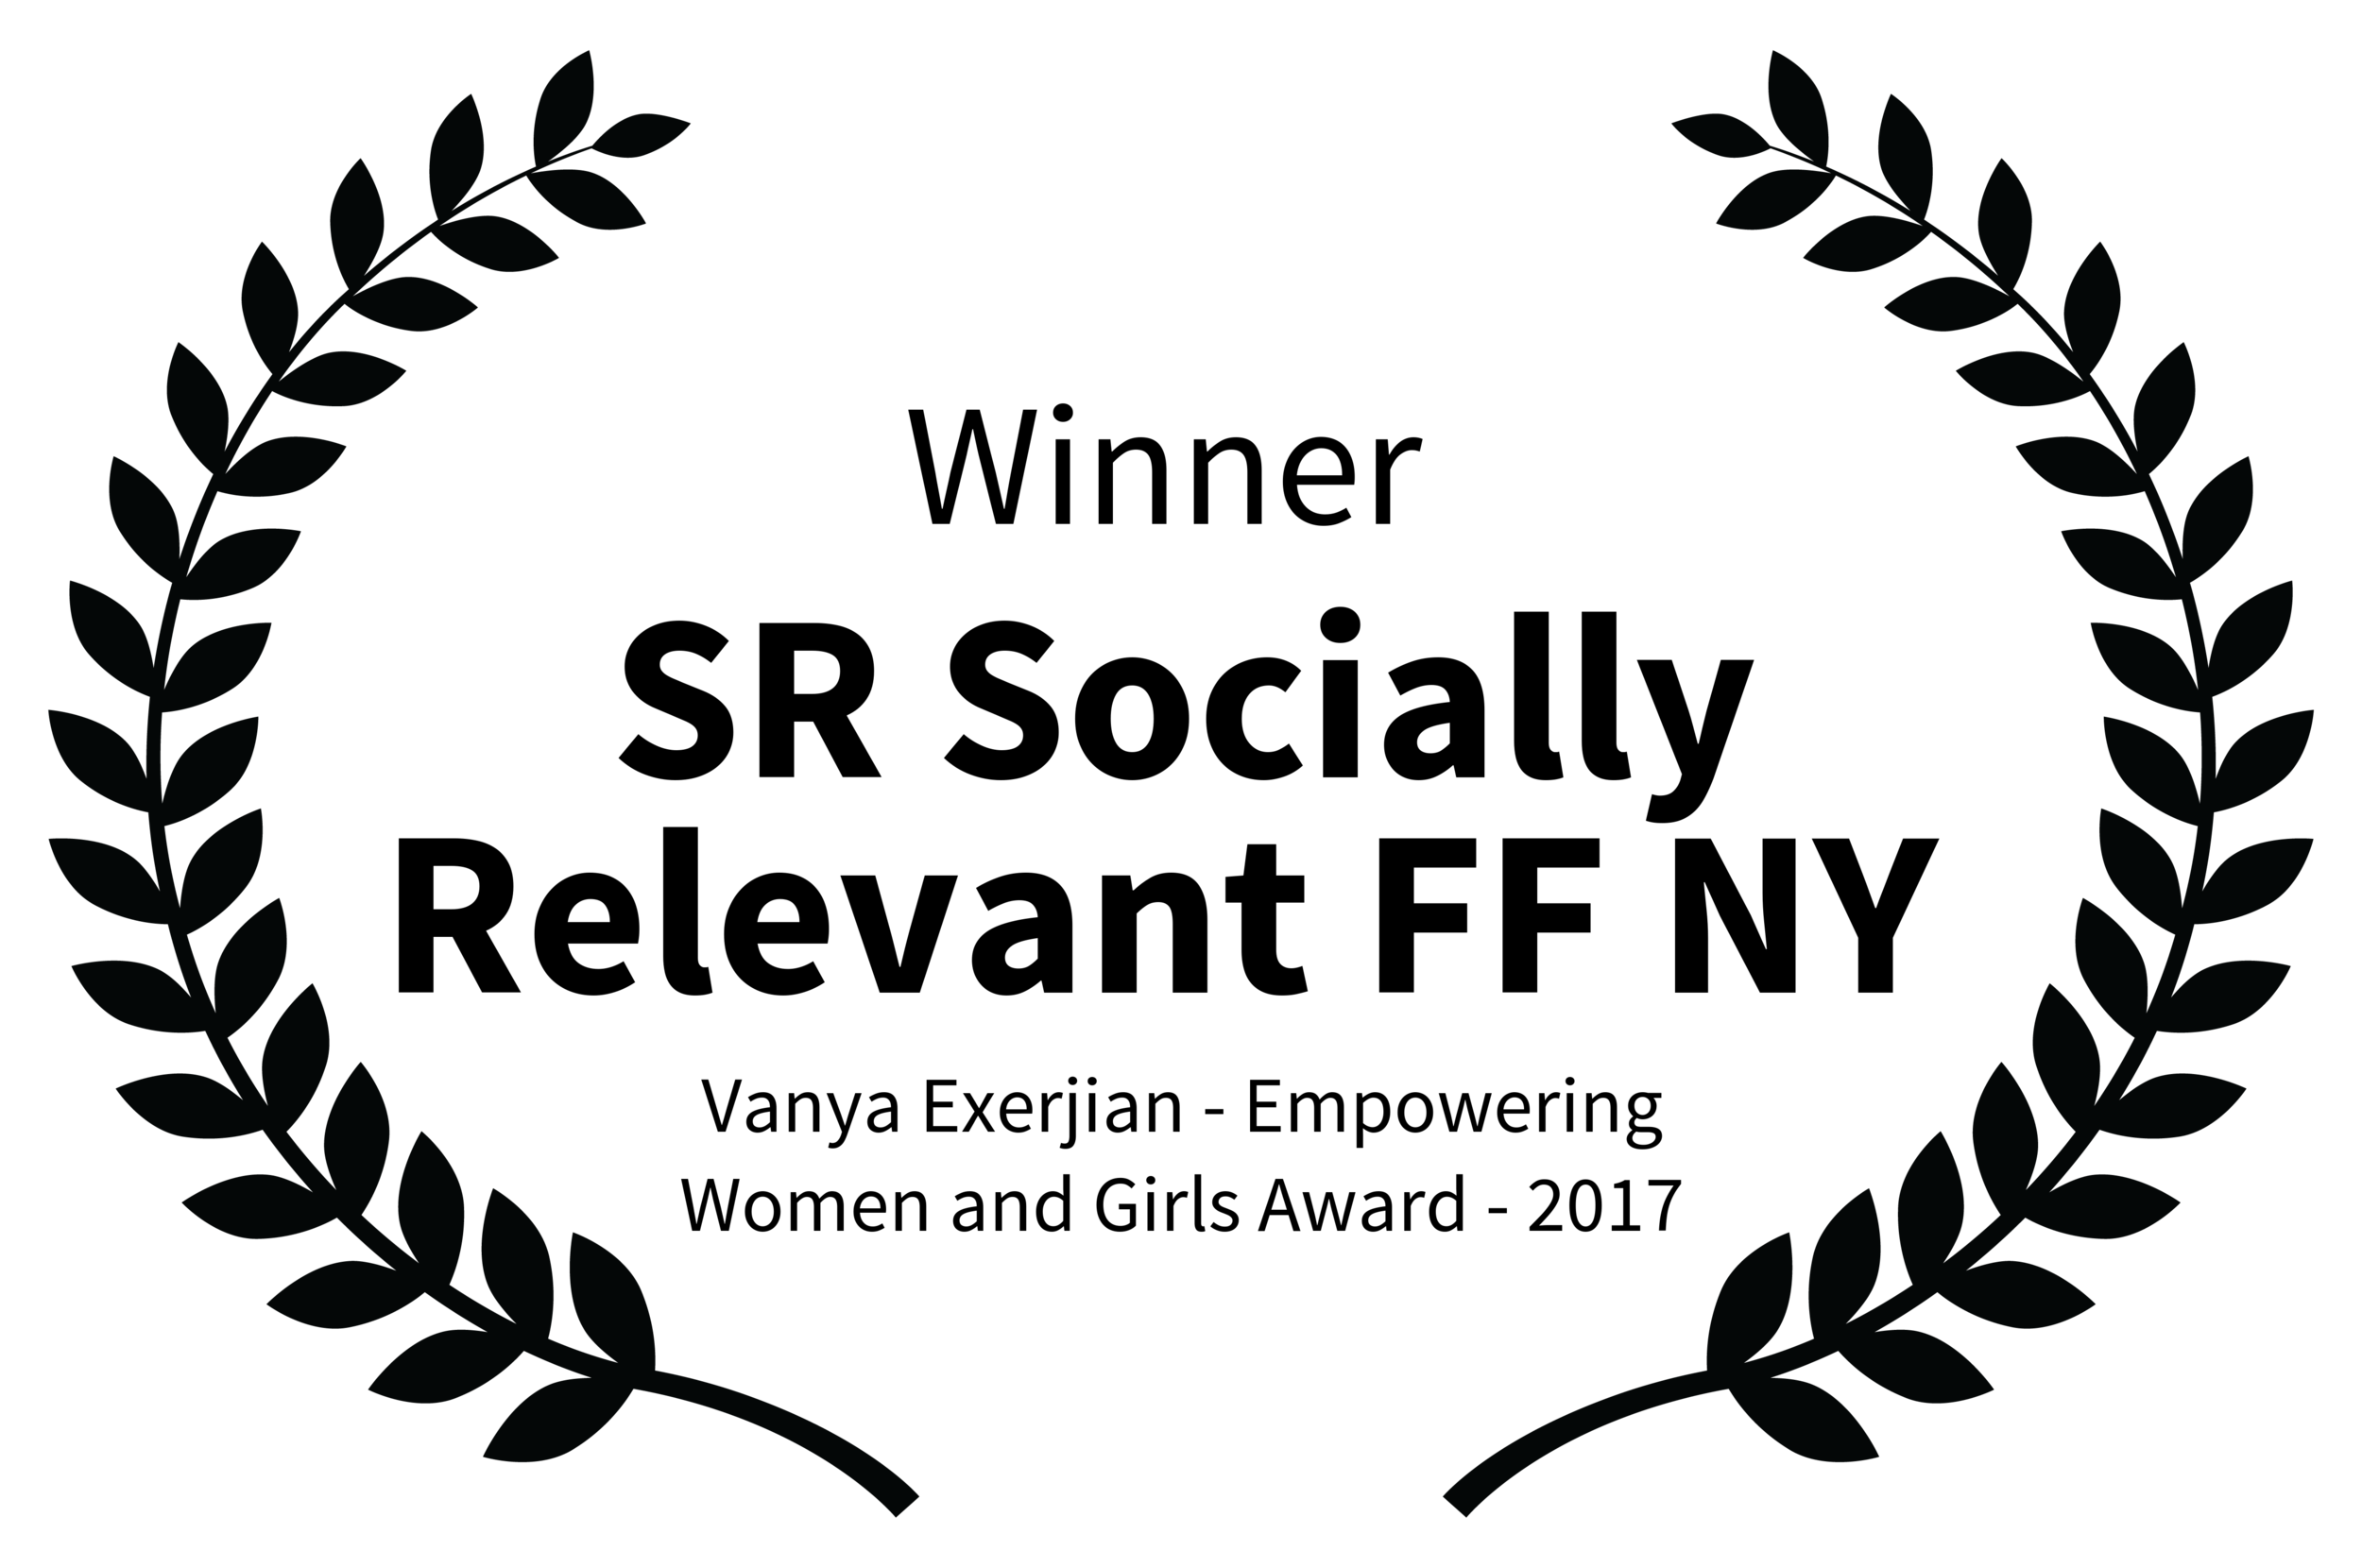 Winner-SRSociallyRelevantFFNY-VanyaExerjian-EmpoweringWomenandGirlsAward-2017.png